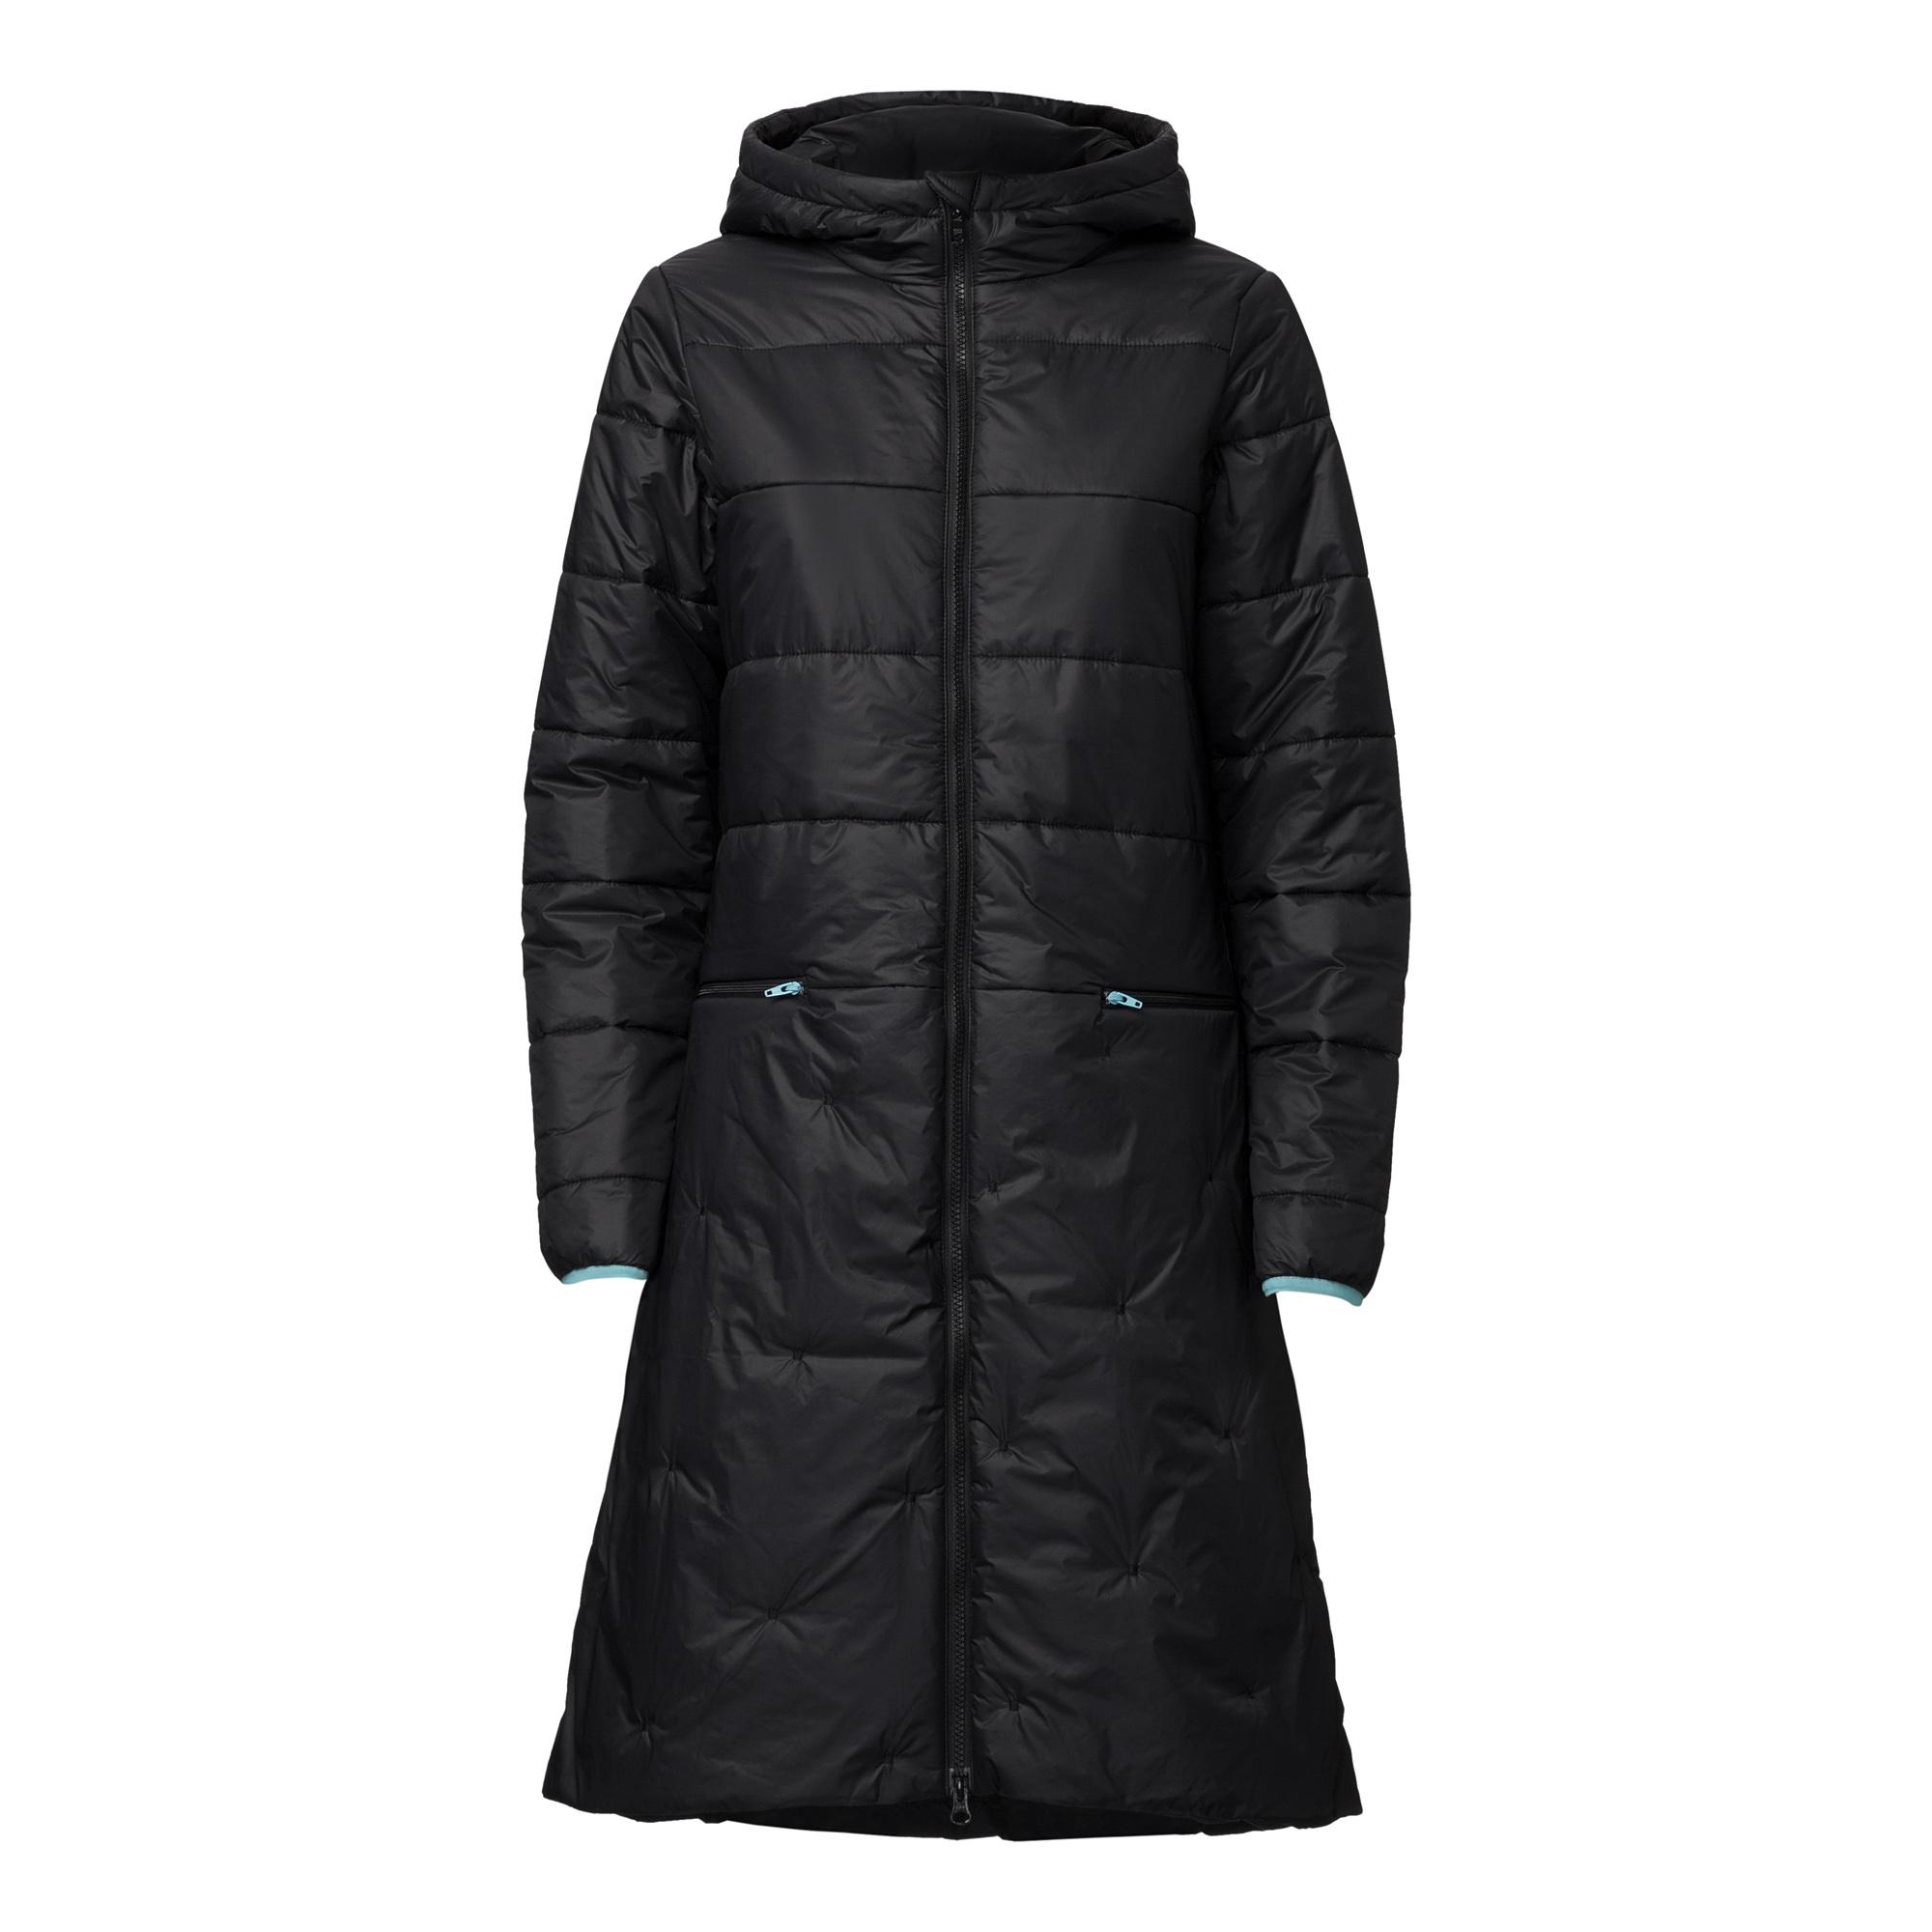 TT2003 Kapok Coat Woman Black PETA-Approved Vegan